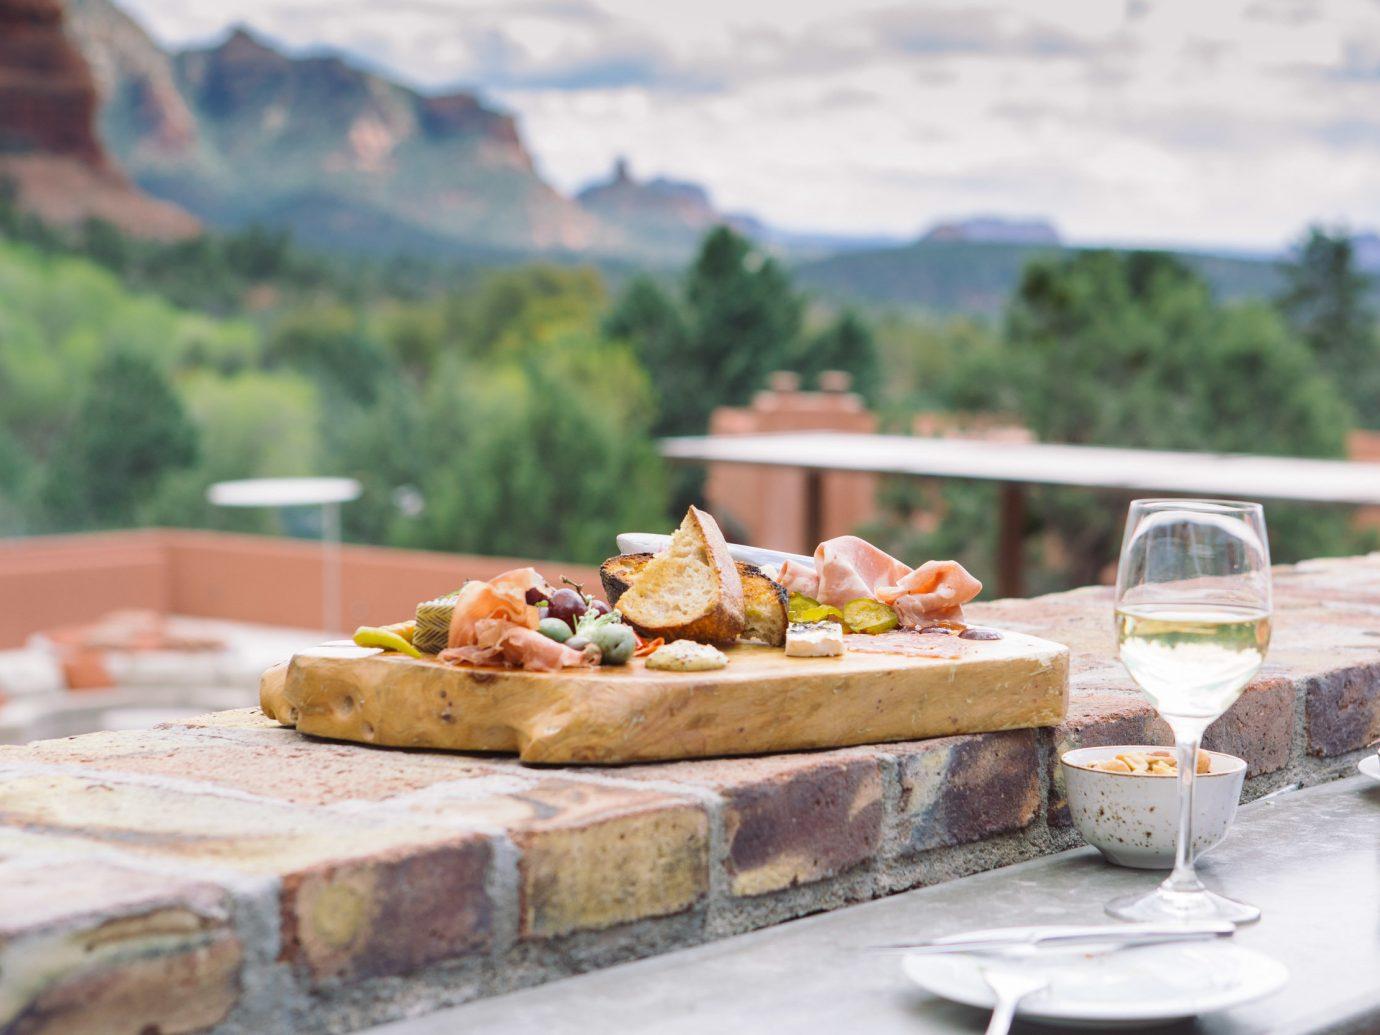 Hotels Jetsetter Guides Luxury Travel Trip Ideas Weekend Getaways outdoor food brunch cuisine meal dish